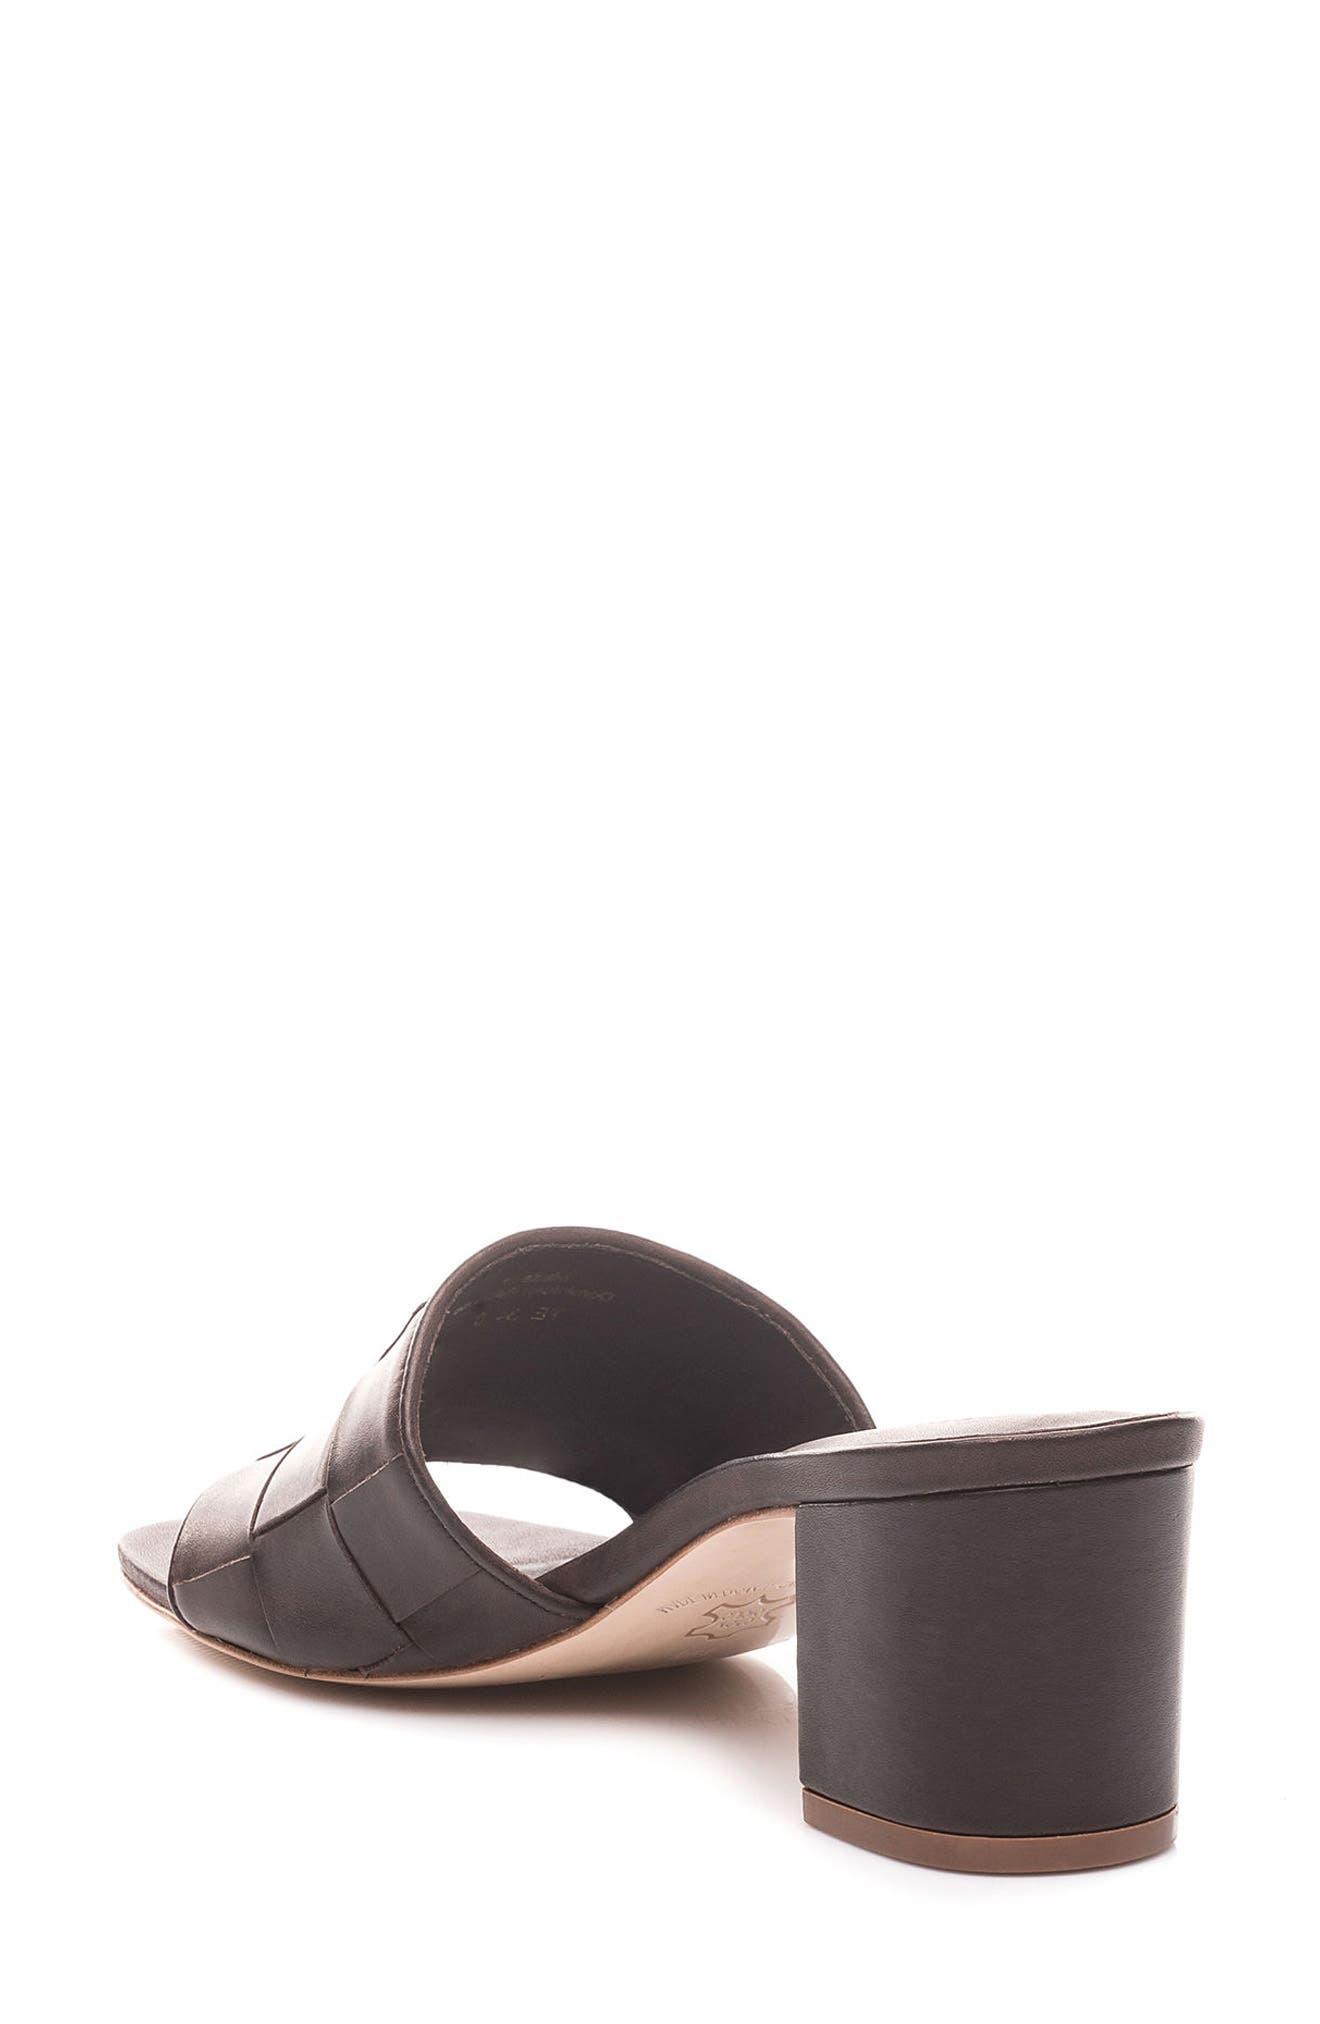 Bernardo Bridget Block Heel Sandal,                             Alternate thumbnail 7, color,